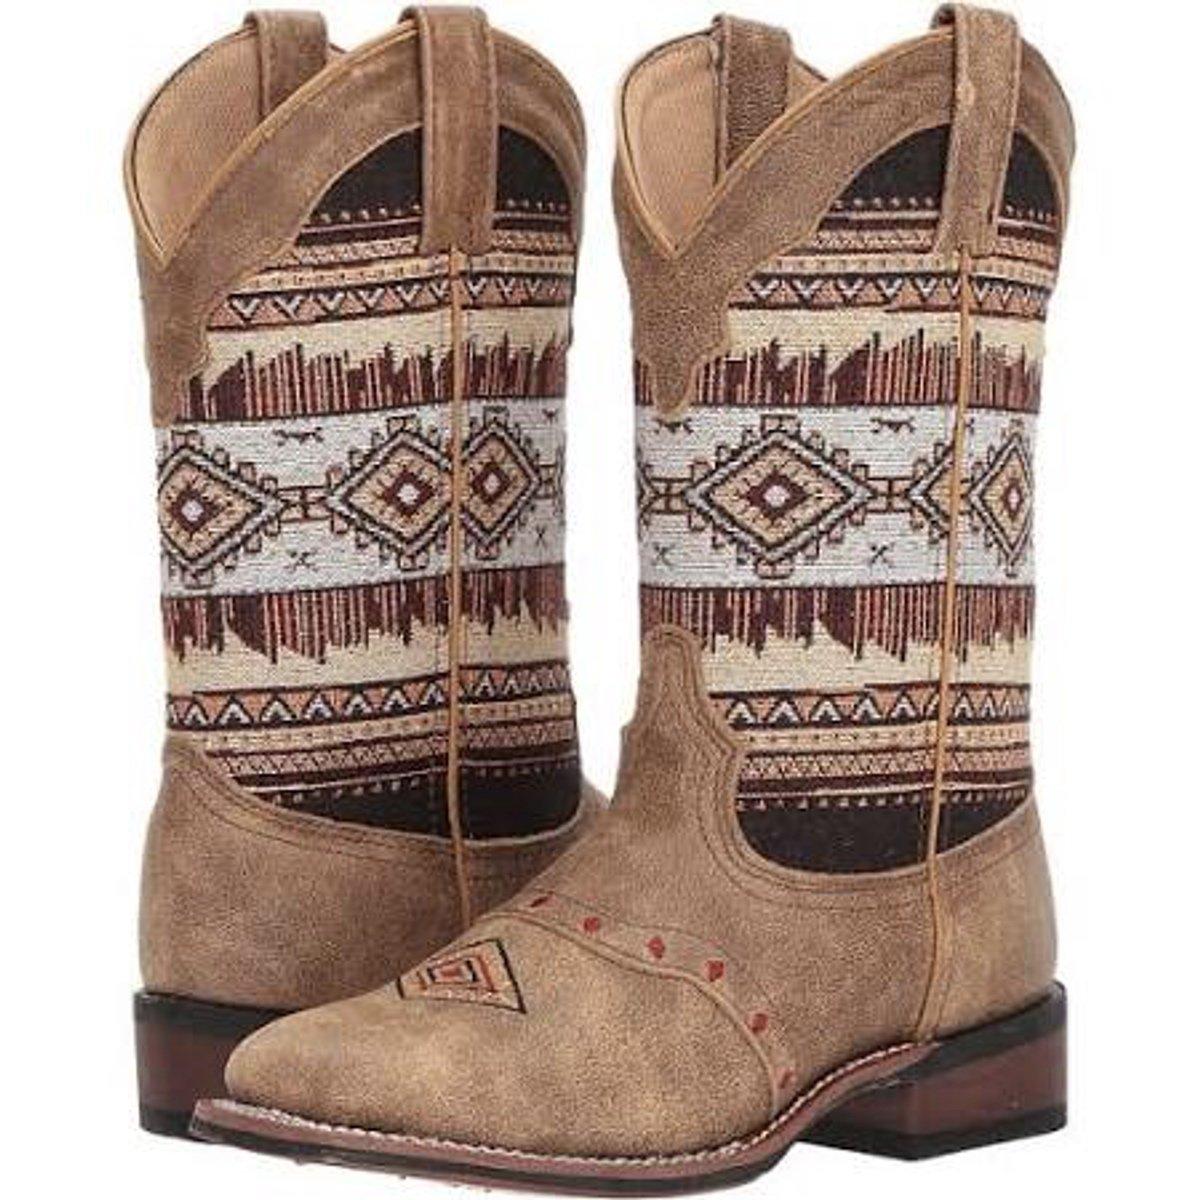 Laredo Women's Scout Tan Aztec Square Toe Boot 5638 B072FQ284H 10 B(M) US|Tan/Aztec